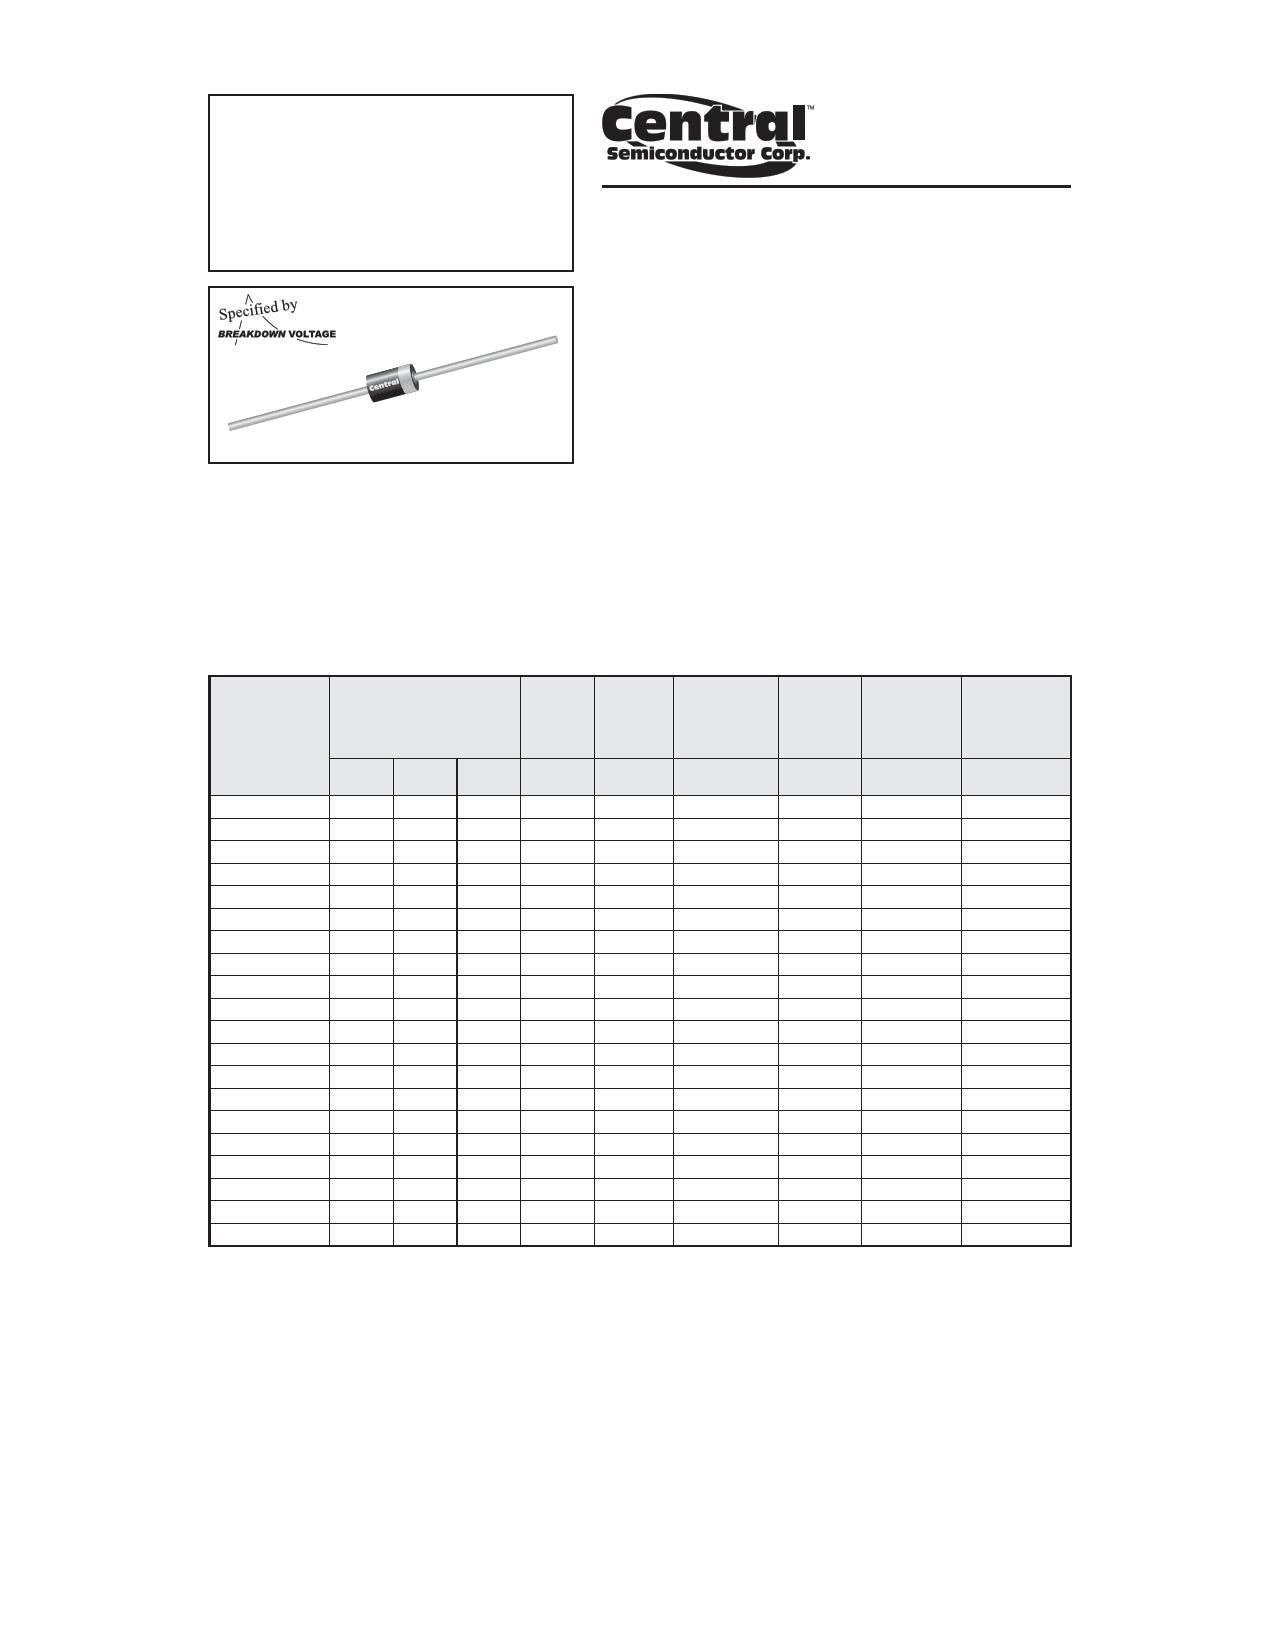 1.5CE20A datasheet